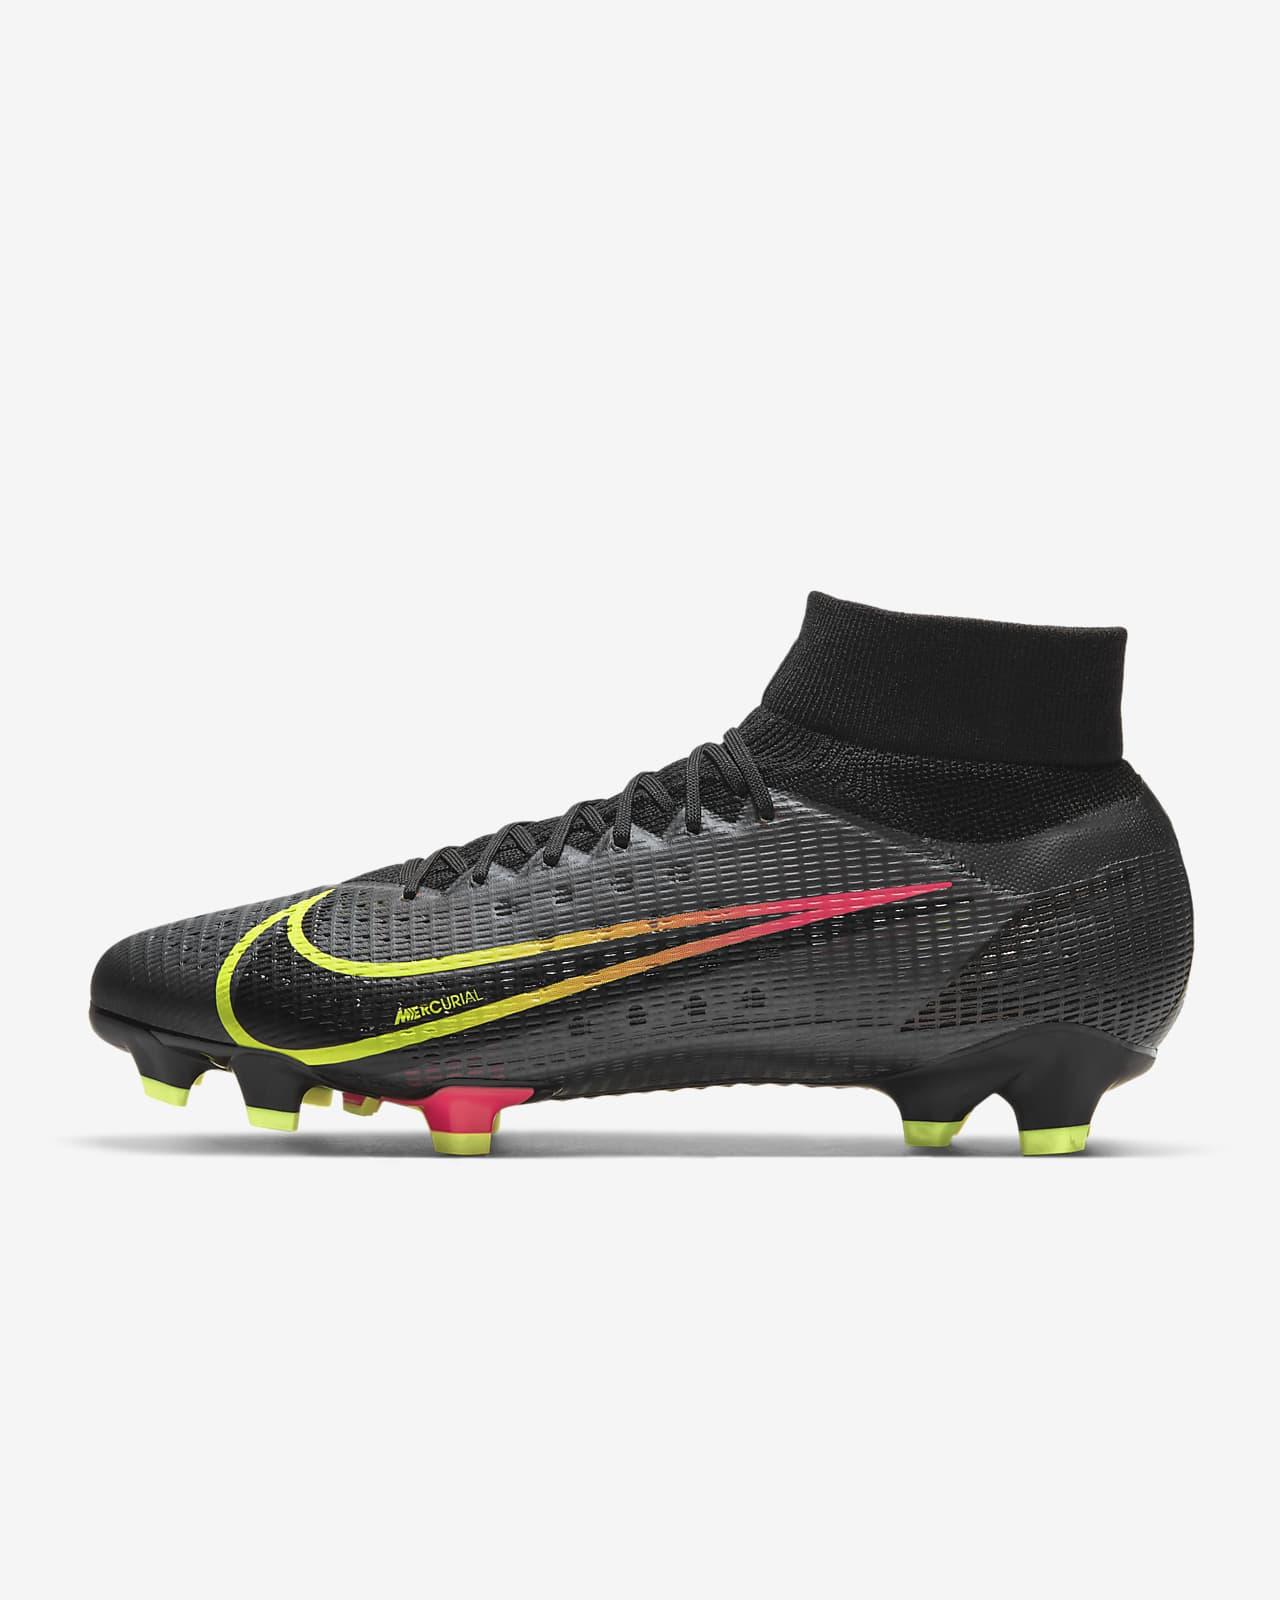 Nike Mercurial Superfly 8 Pro FG Botas de fútbol para terreno firme